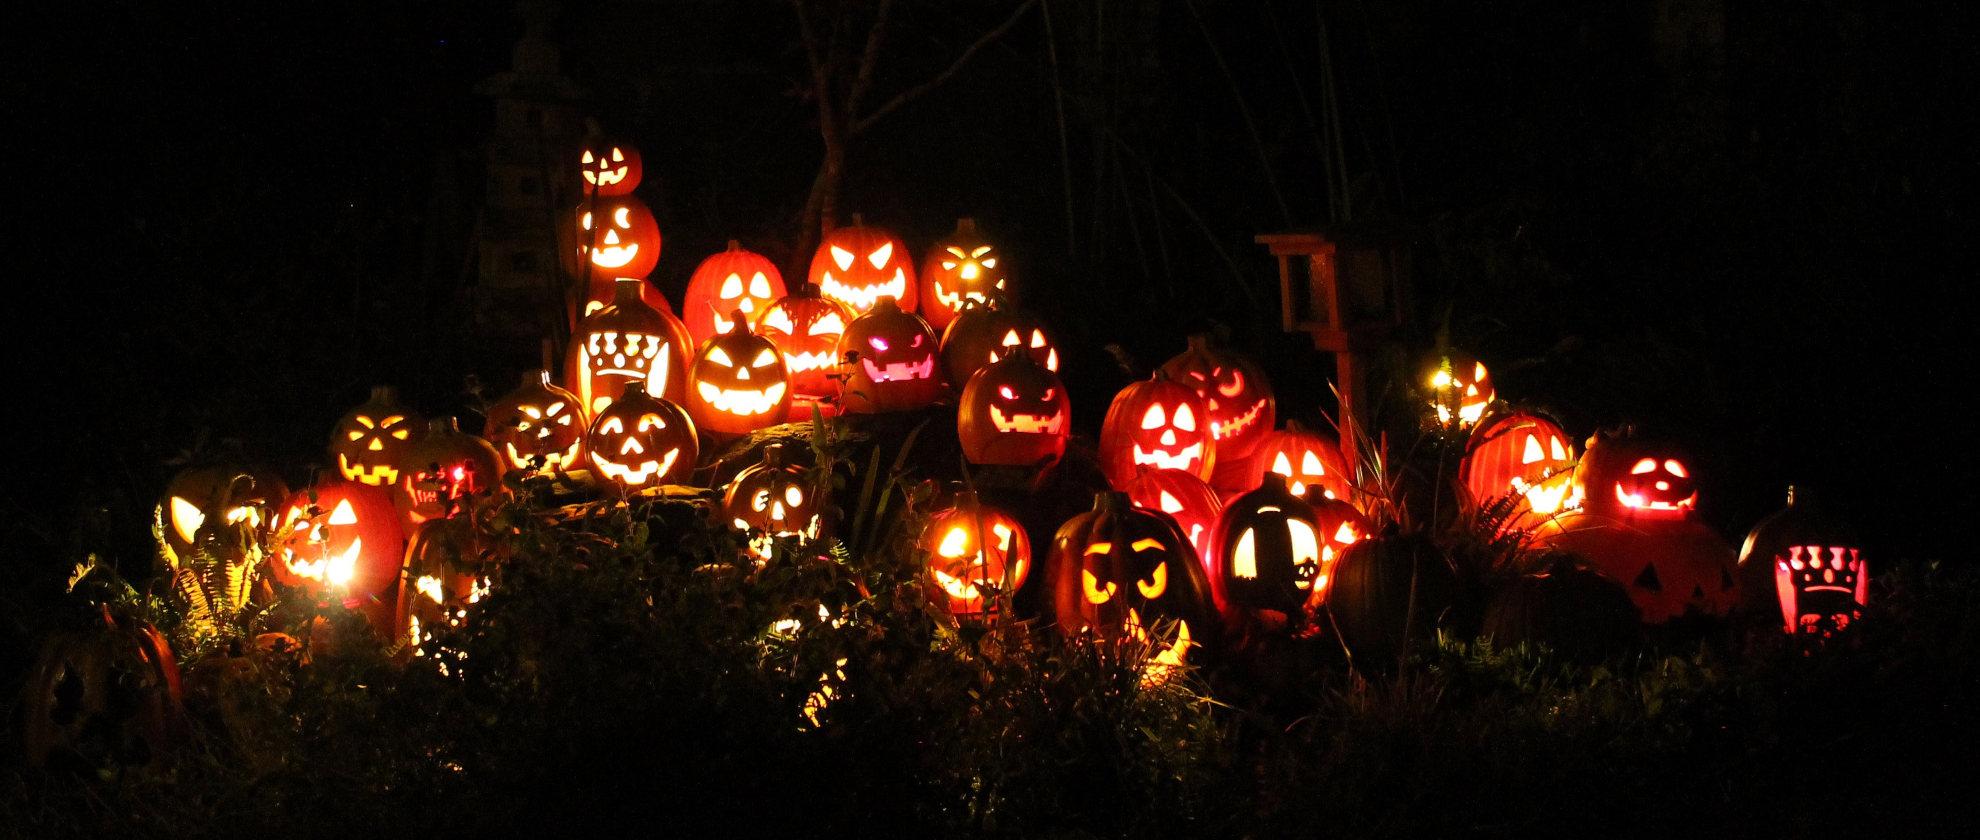 Tasty Treats: Ghoulishly Tasty Halloween Treats